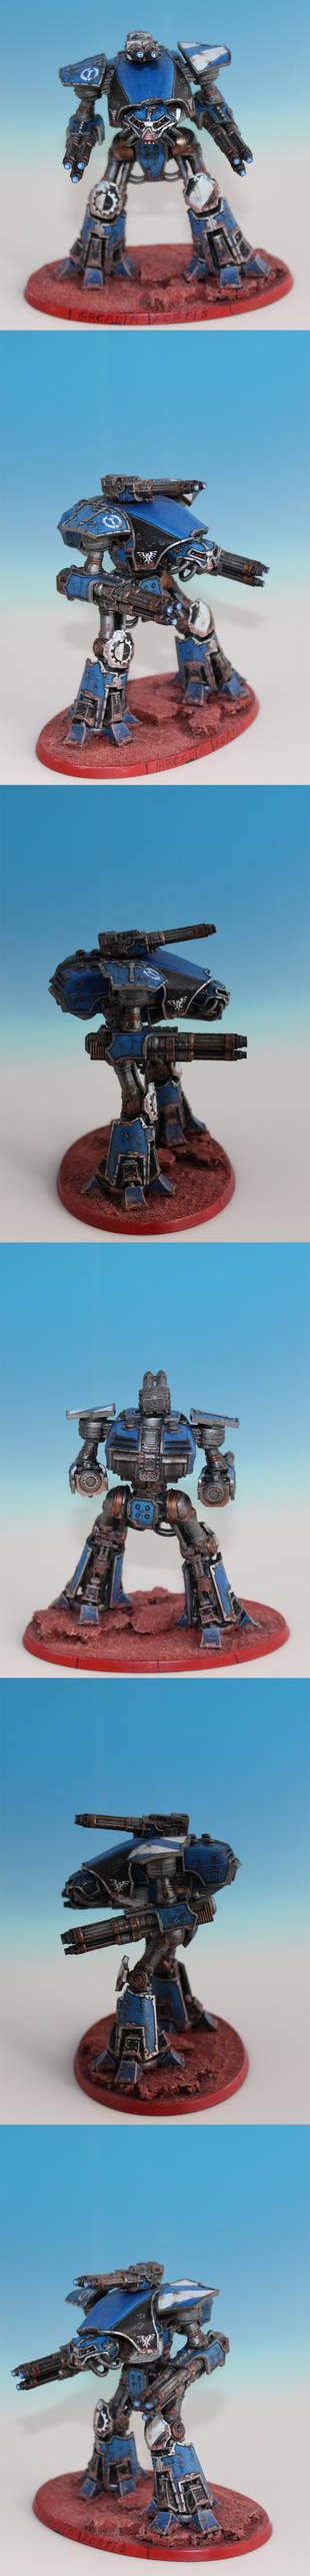 Reaver Battle Titan Arcadia Fortis